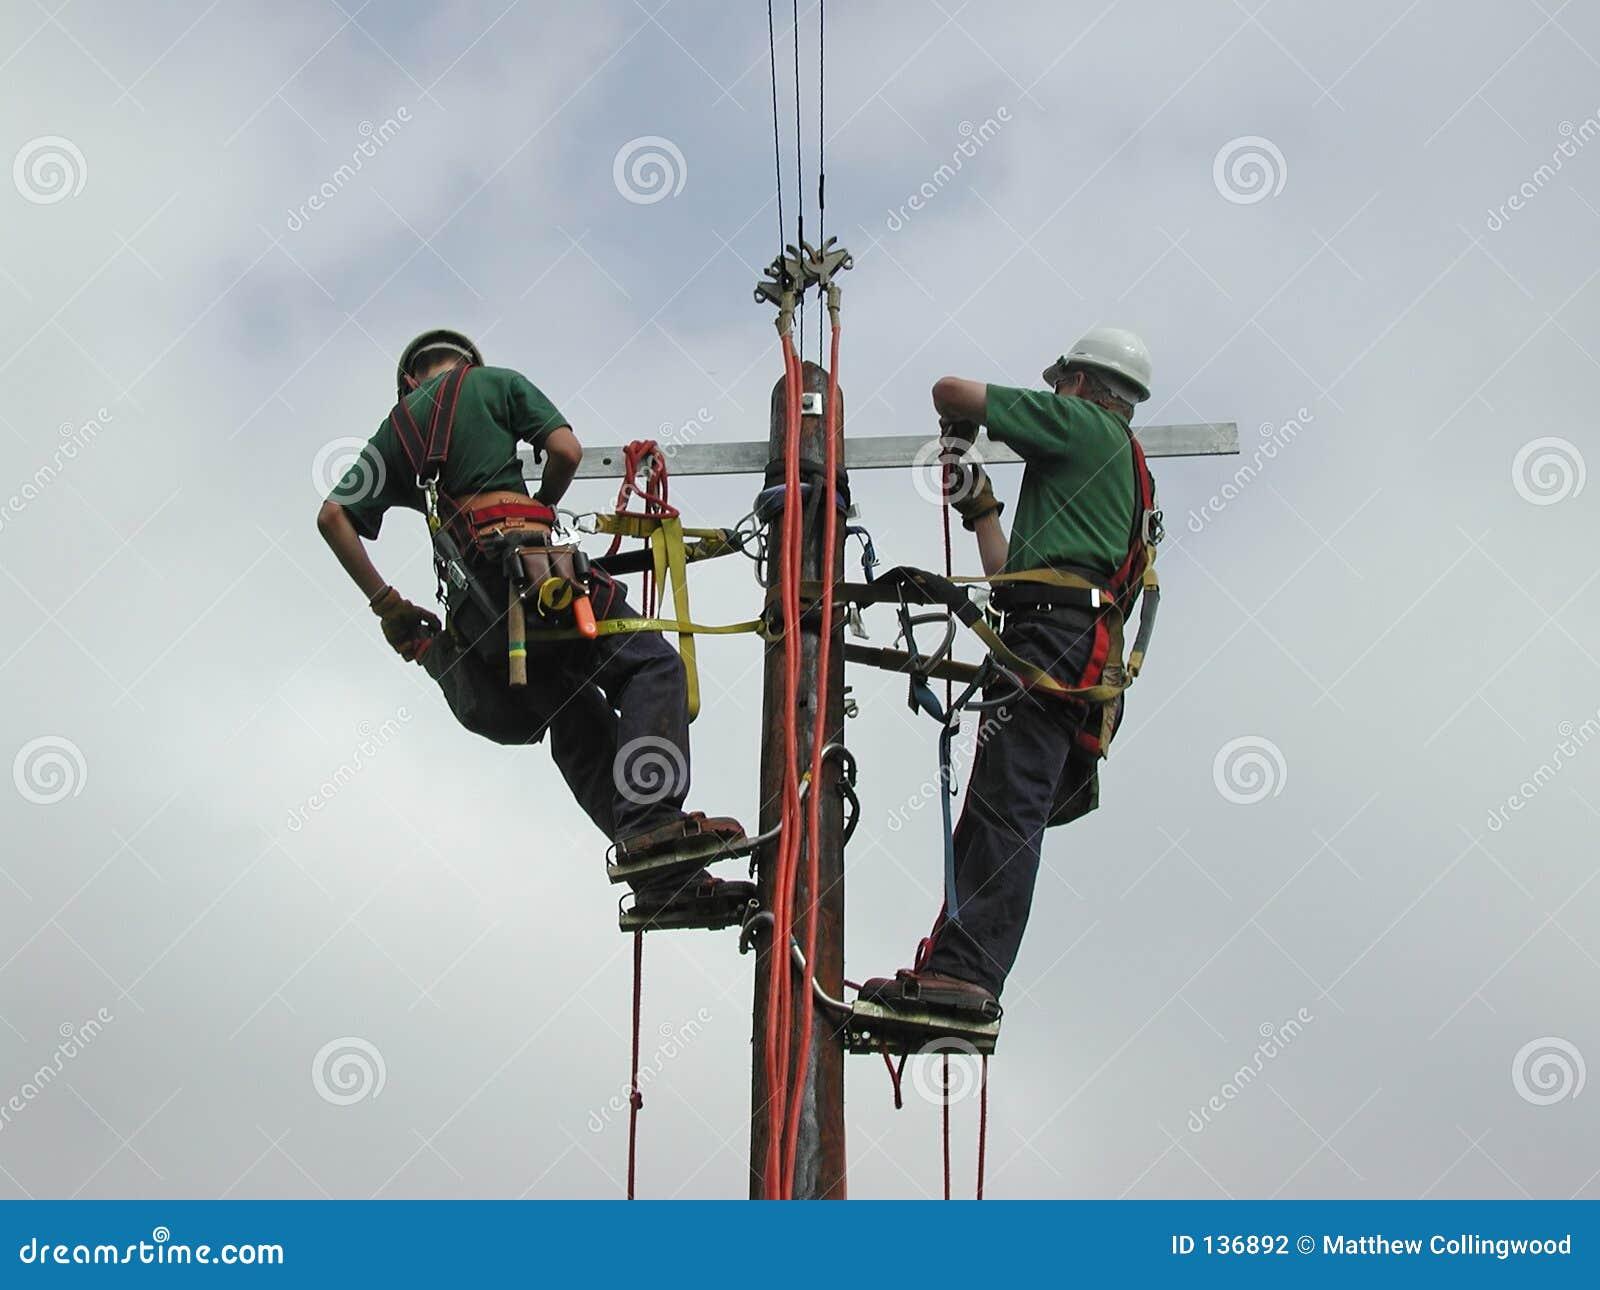 Power Lineman Stock Photography - Image: 136892